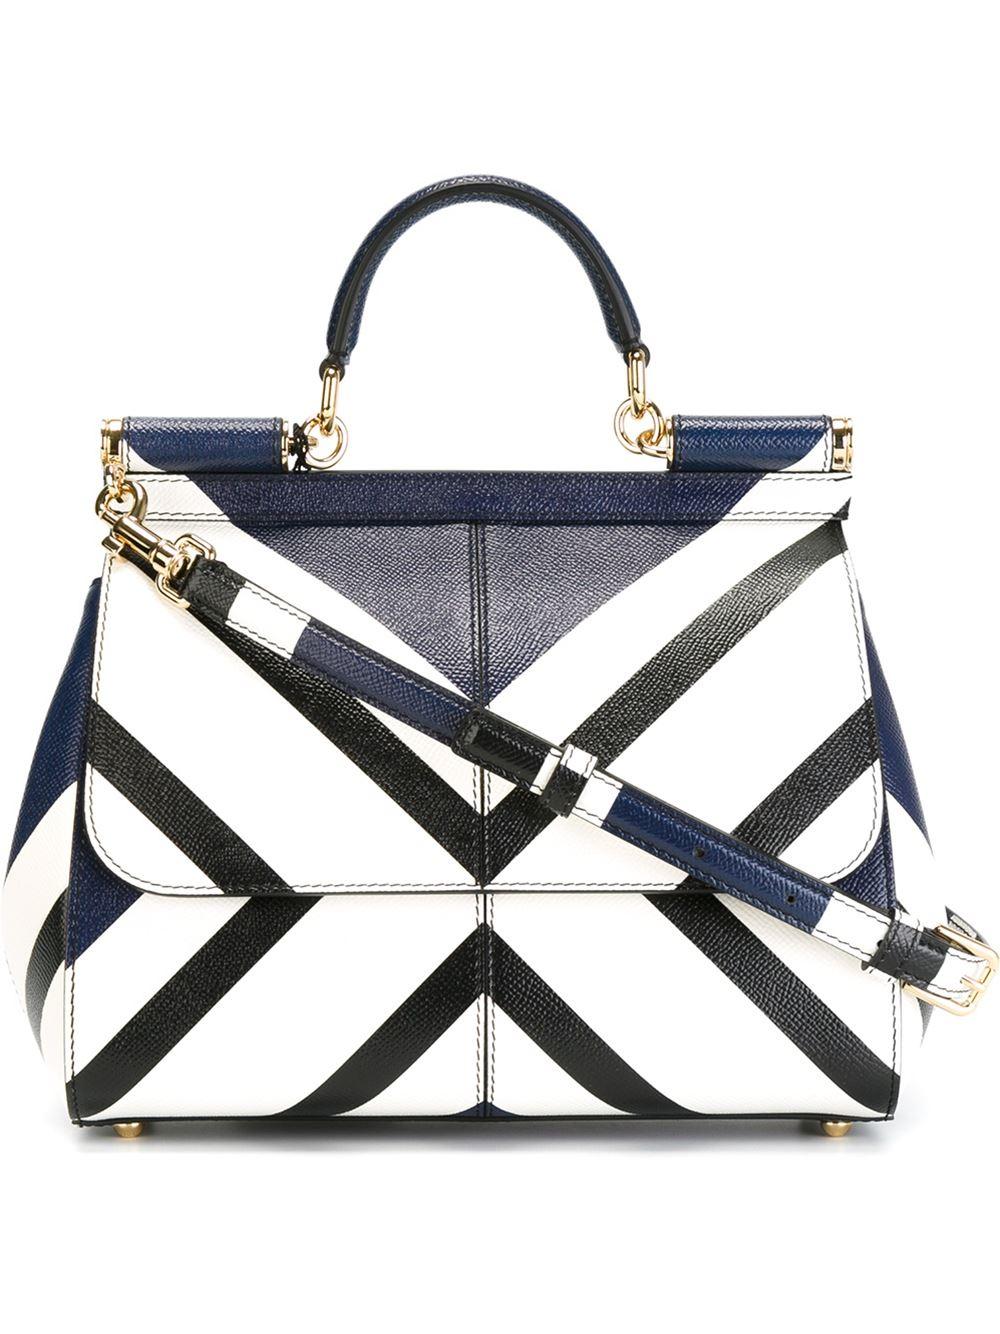 Lyst - Dolce   Gabbana Striped Print Miss Sicily Medium Handbag in Blue c6cf97e4a9f82